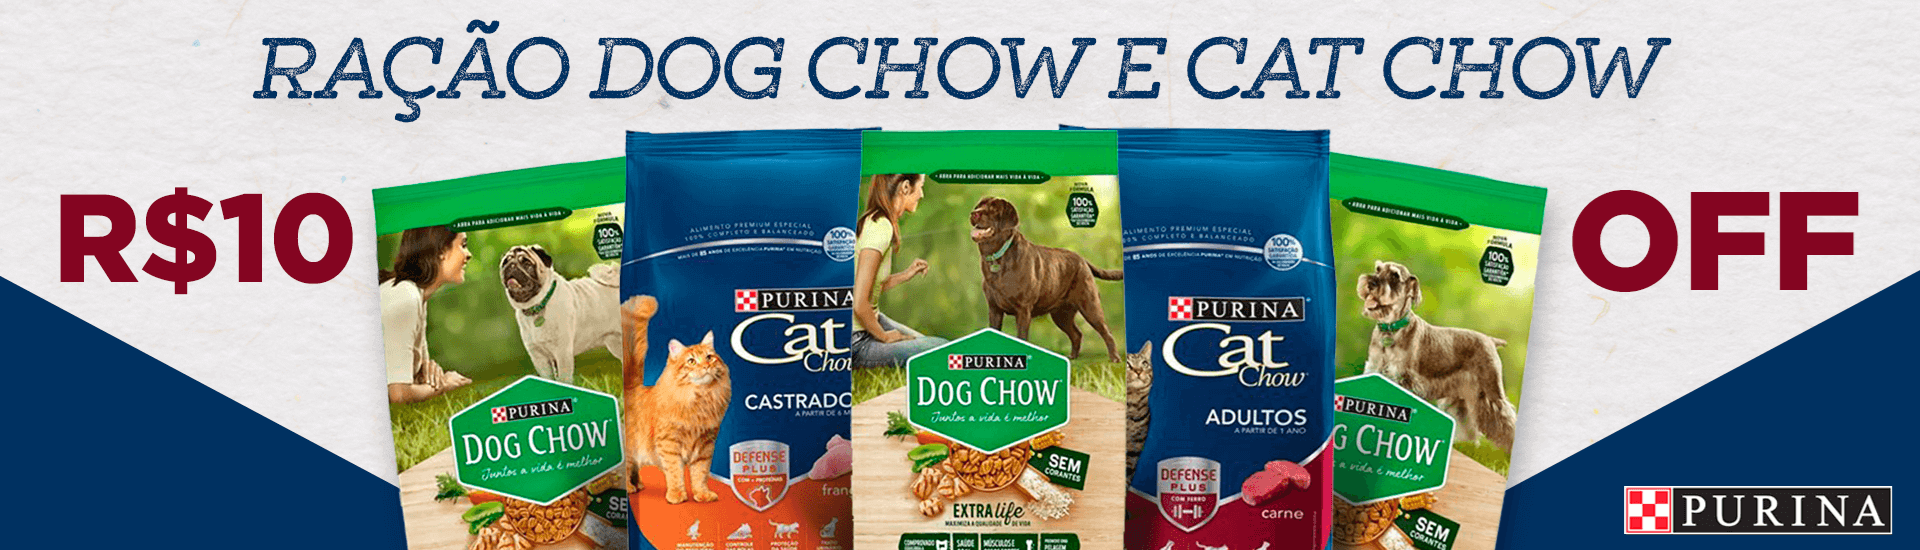 CatChow e DogChow